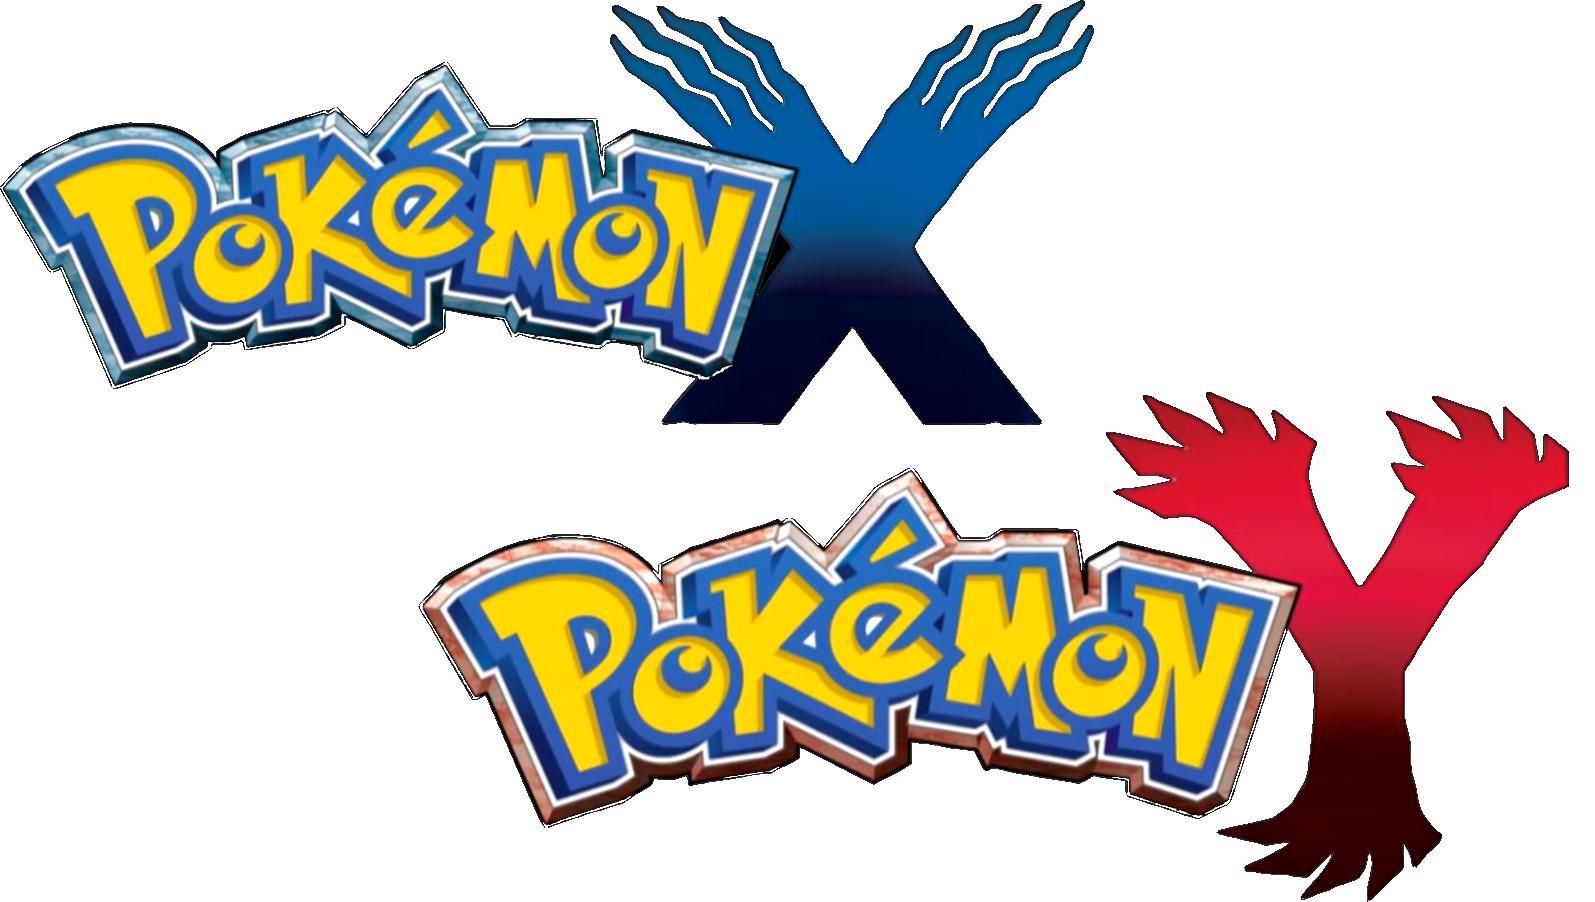 Sixth Pokémon generation